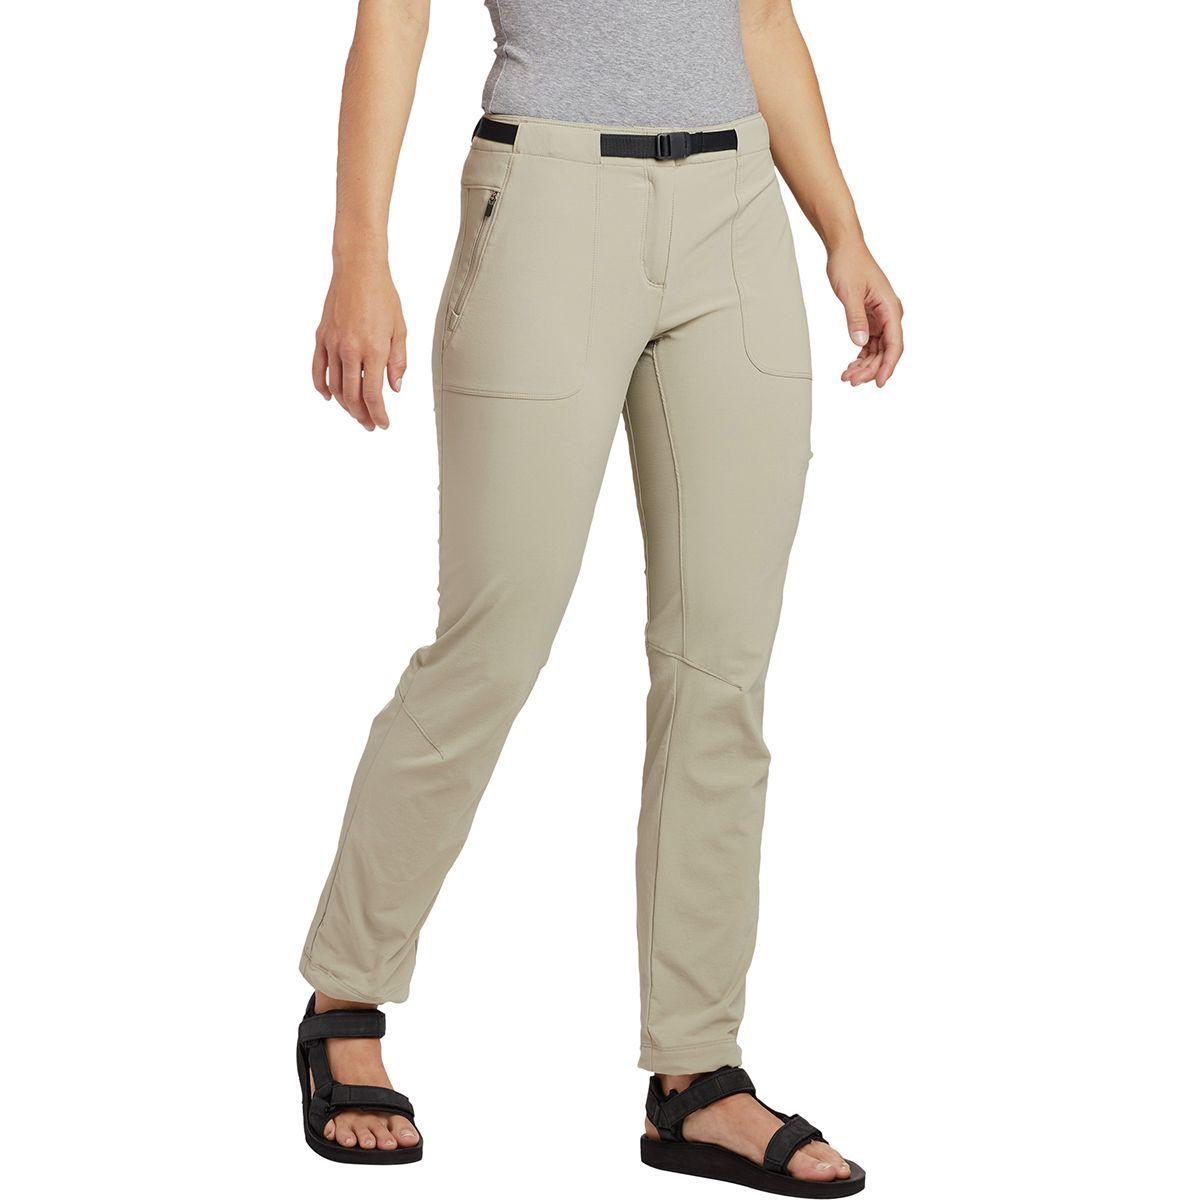 Mountain Hardwear Chockstone Hike Pant - Women's